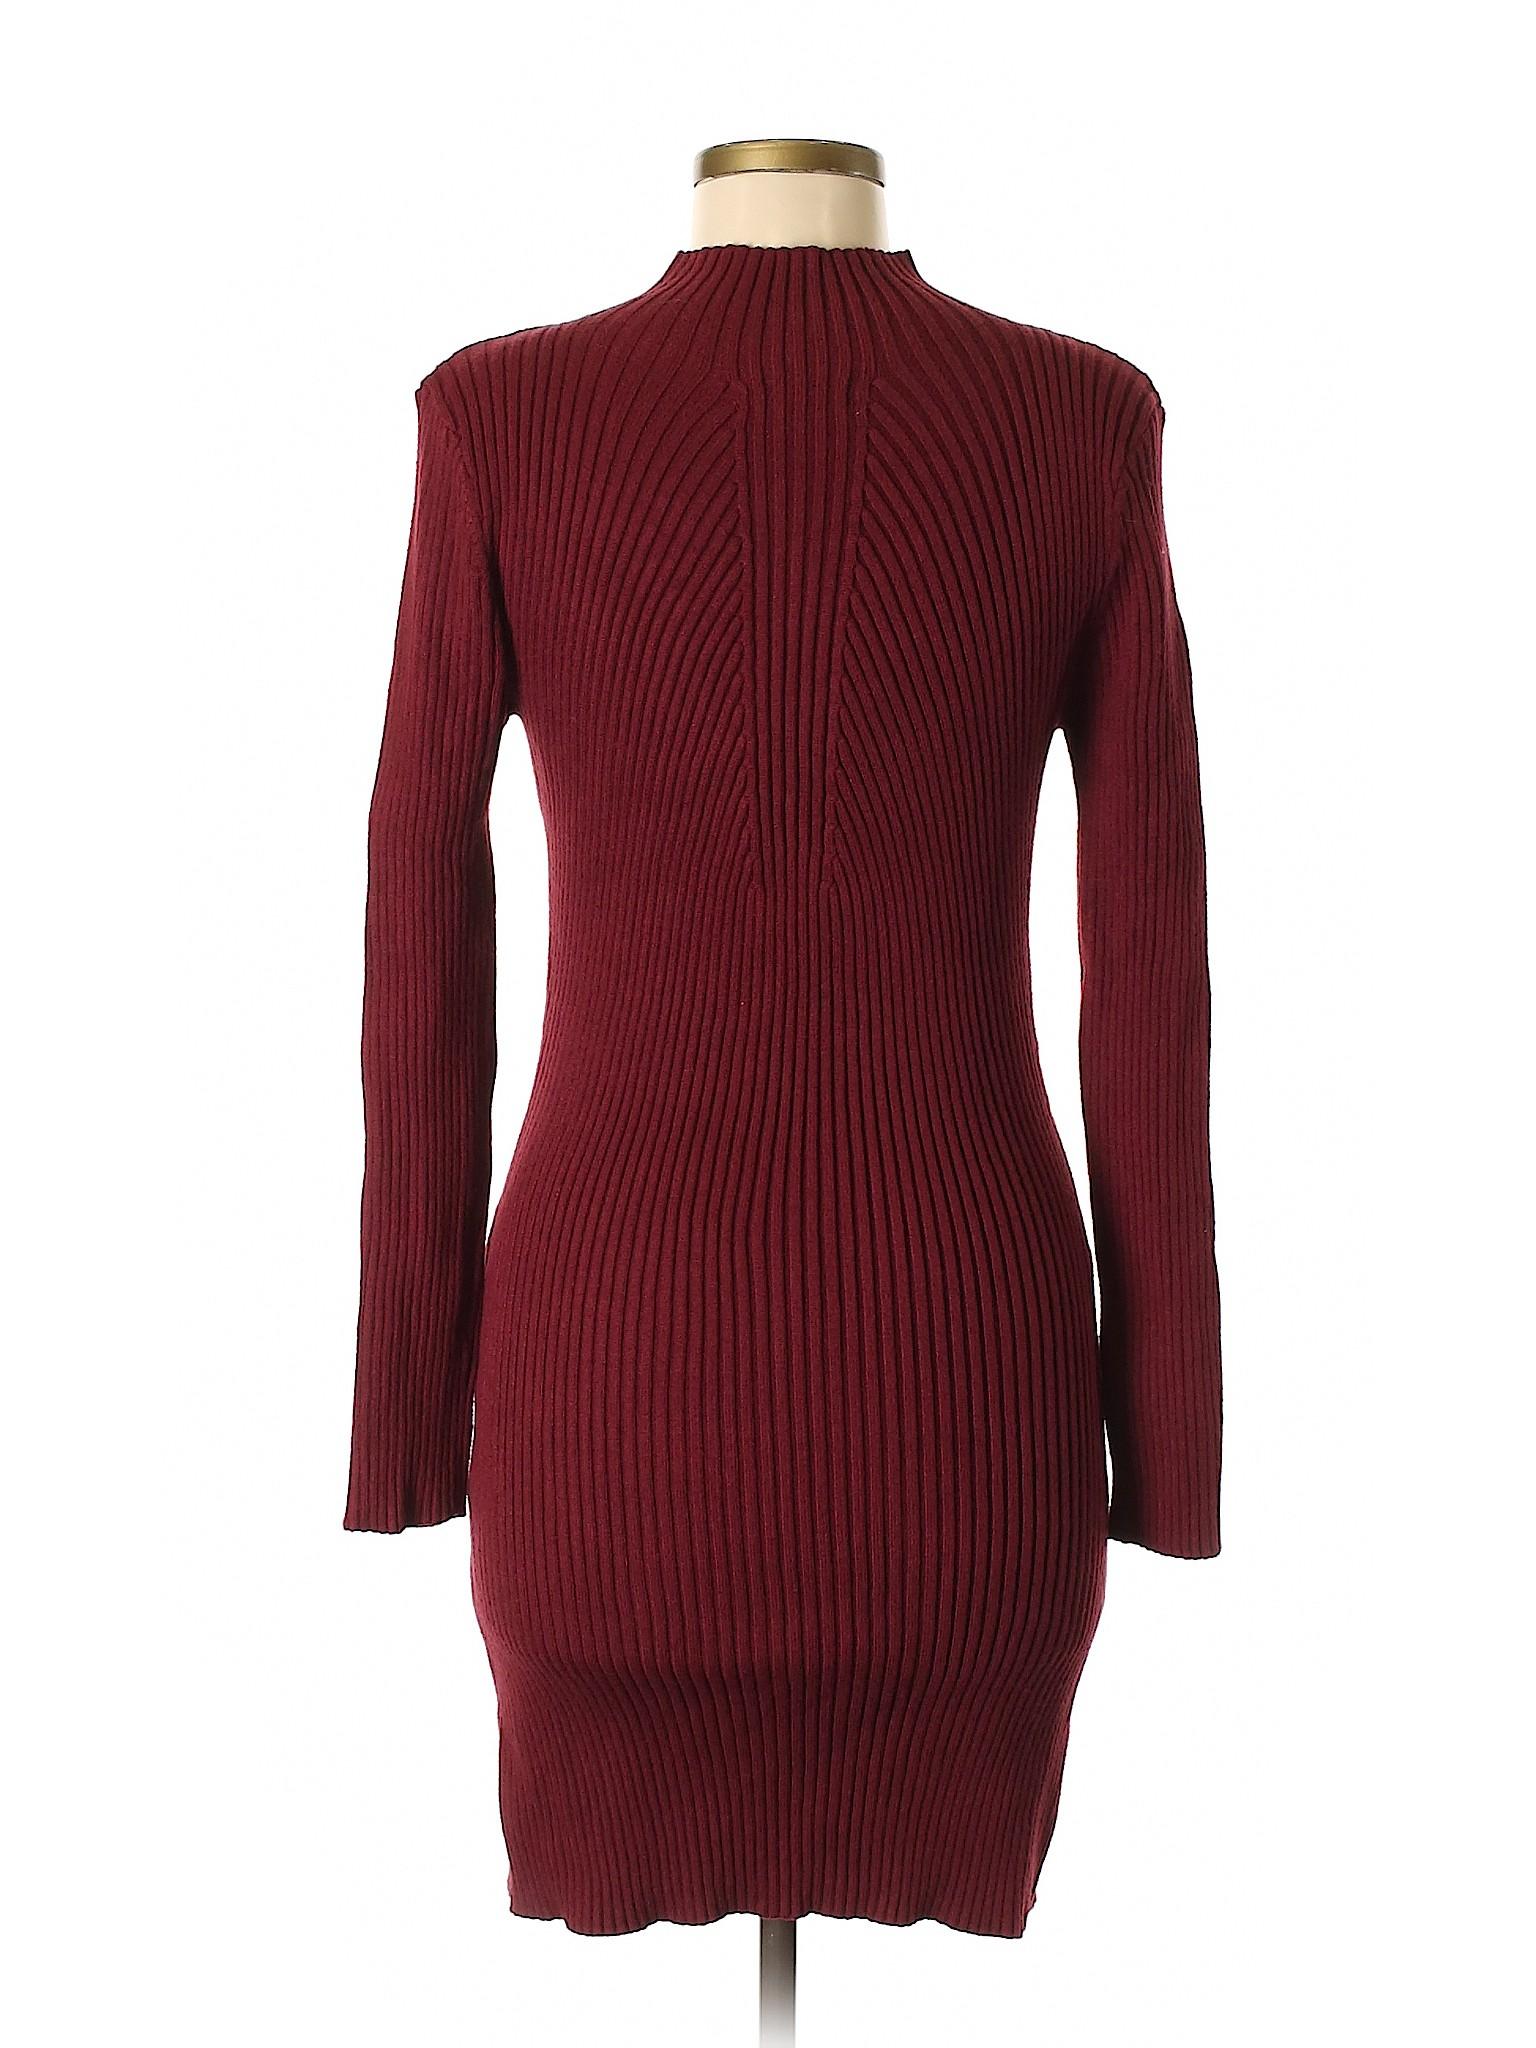 Casual winter Nova Fashion Boutique Dress n0t7gnW